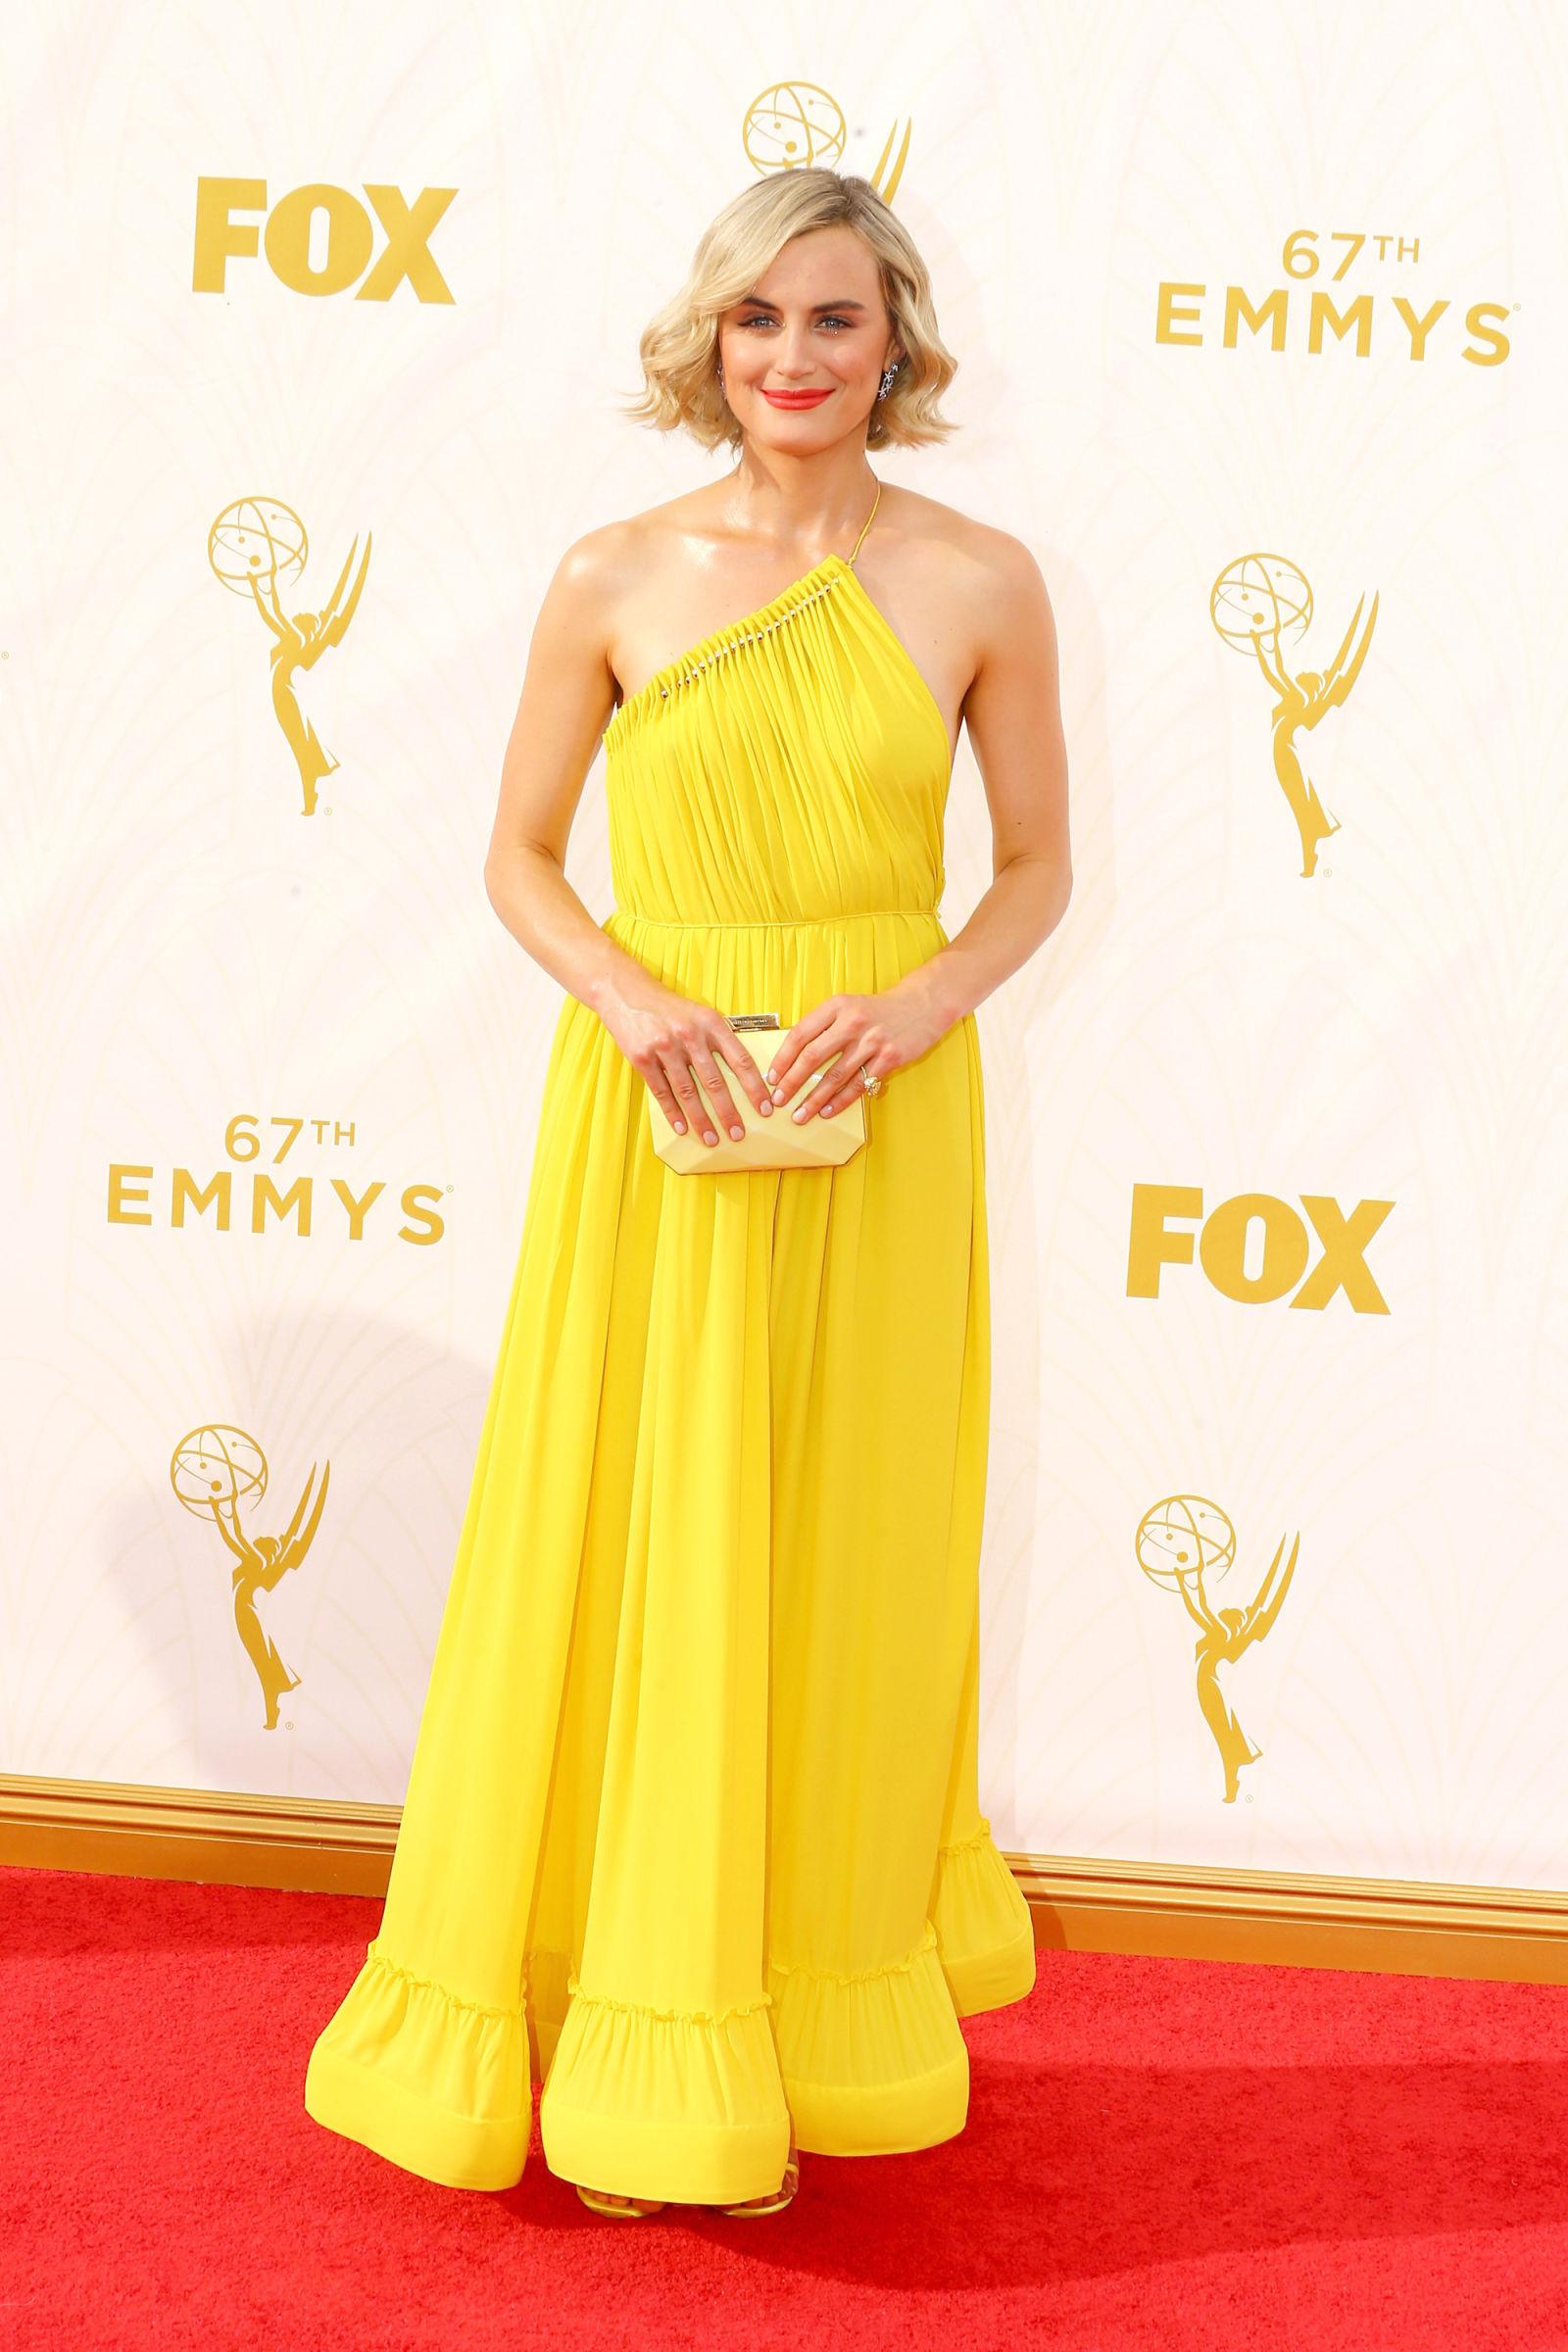 Emmys-2015-Taylor-Schilling